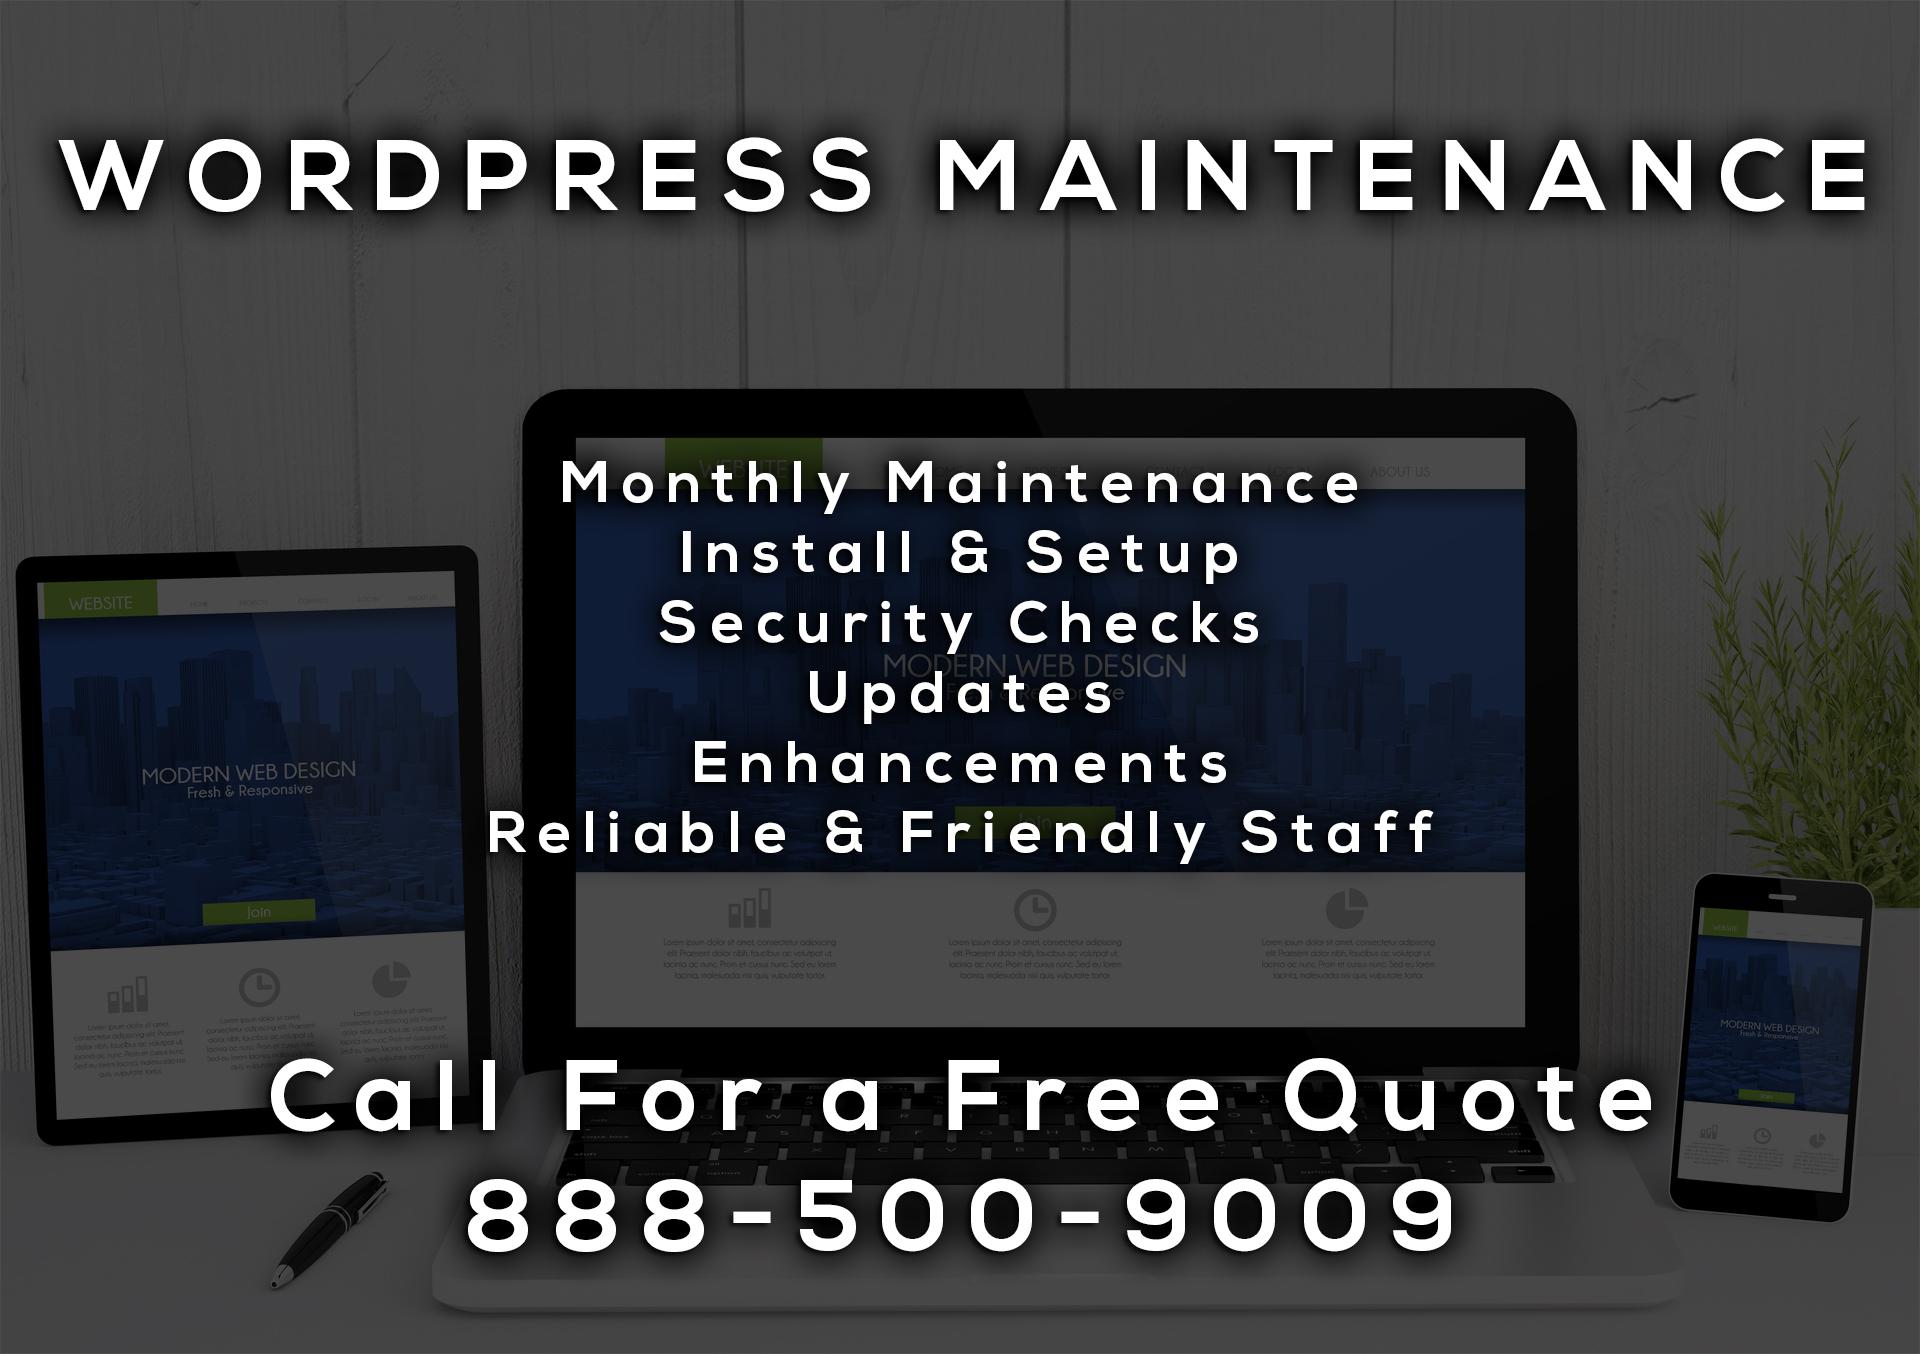 WordPress Maintenance Services Santa Fe Springs CA